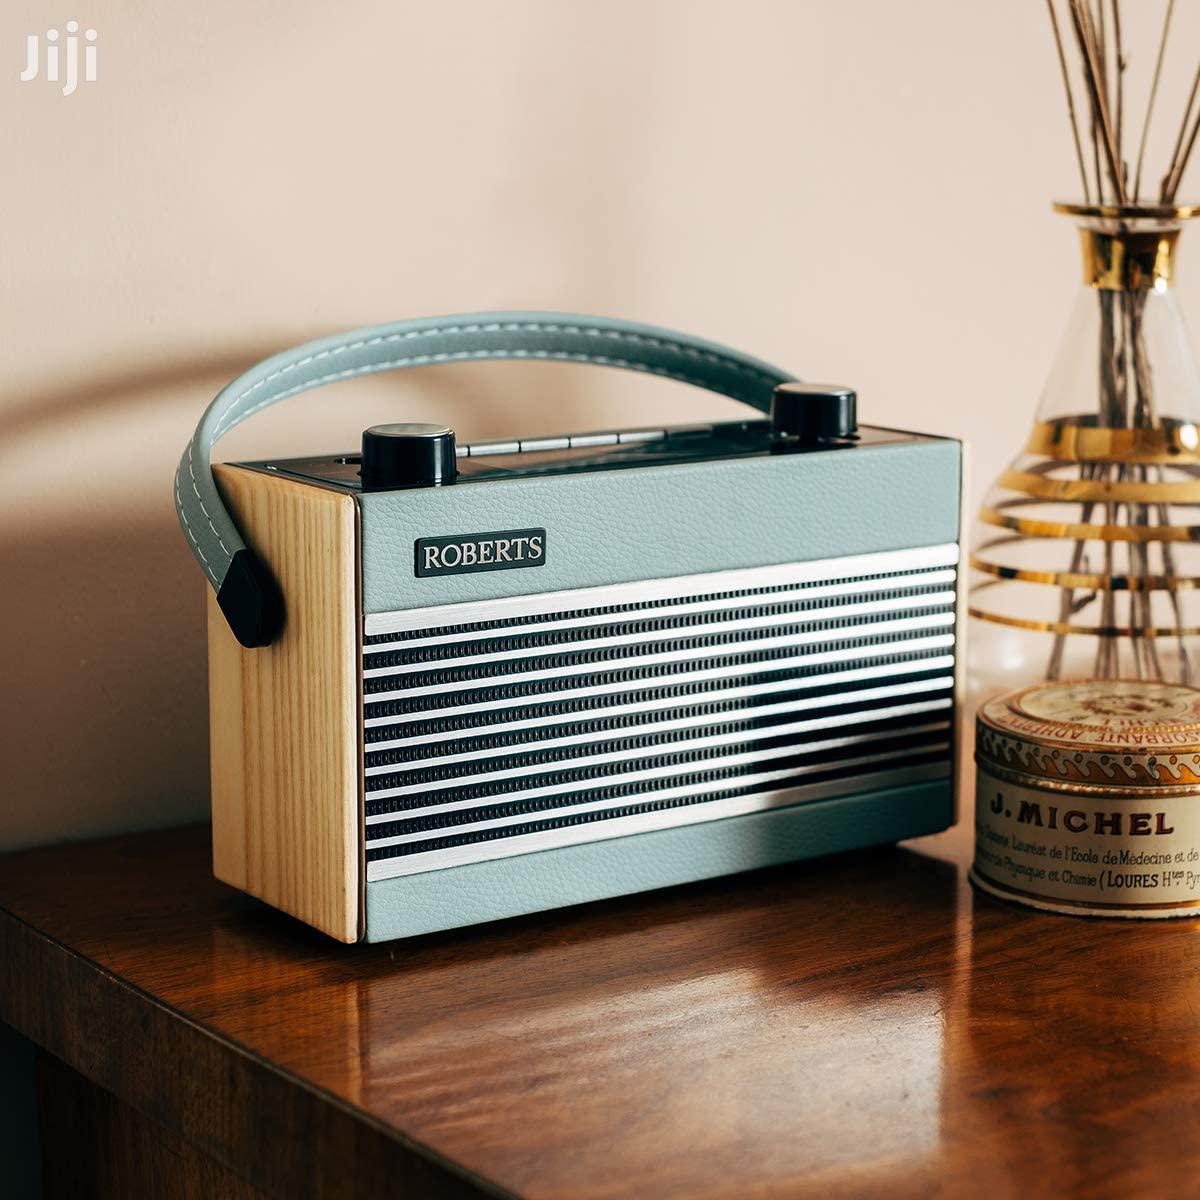 Roberts Rambler BT Retro/Digital Portable Bluetooth Radio